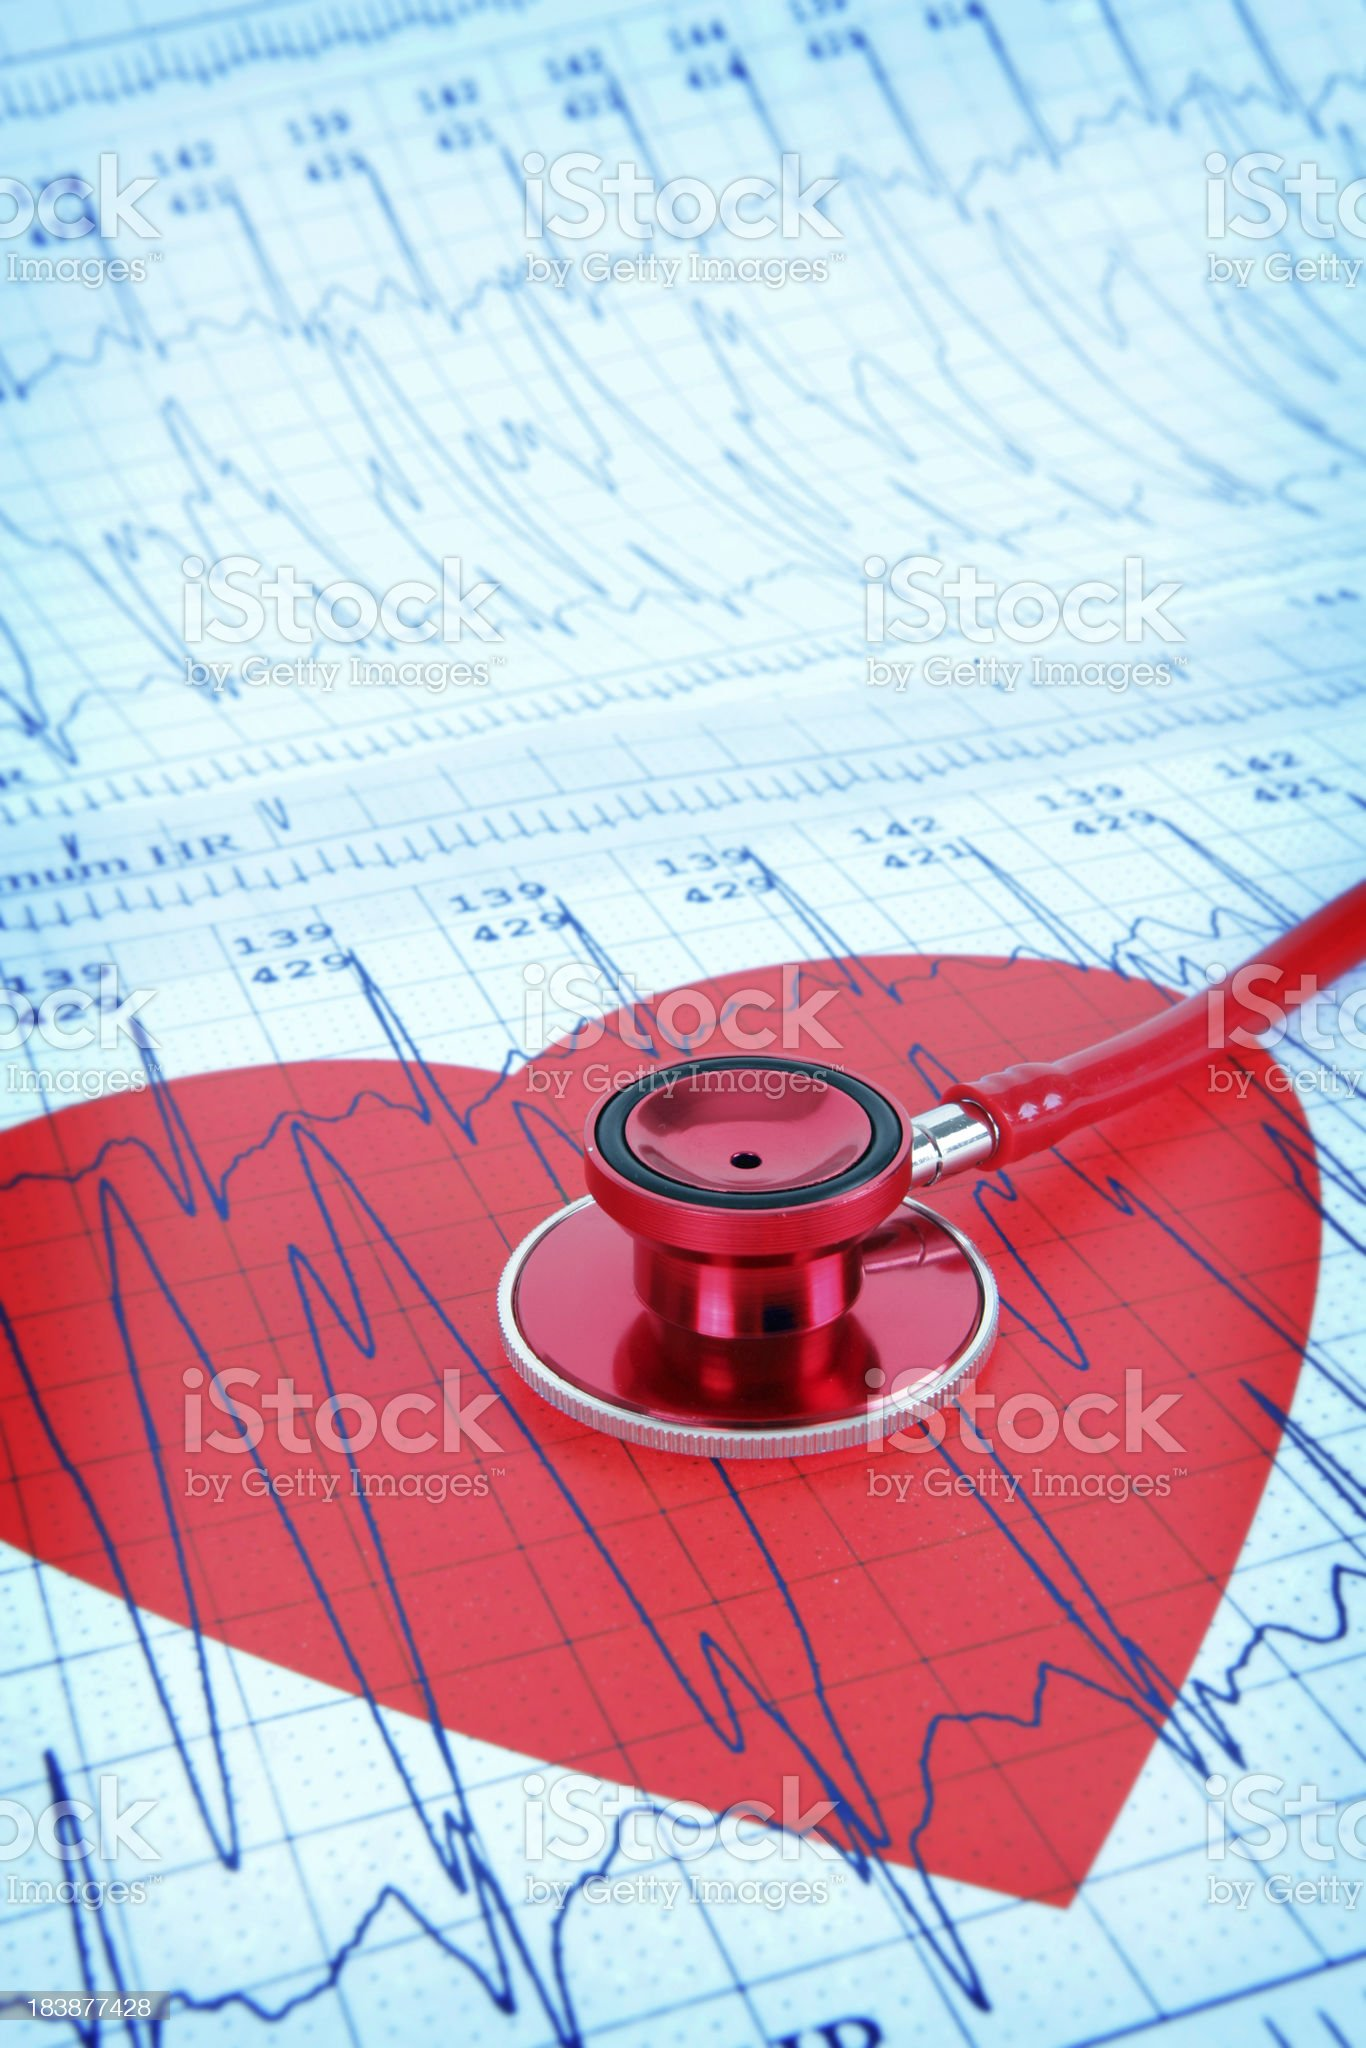 Beating Heart royalty-free stock photo